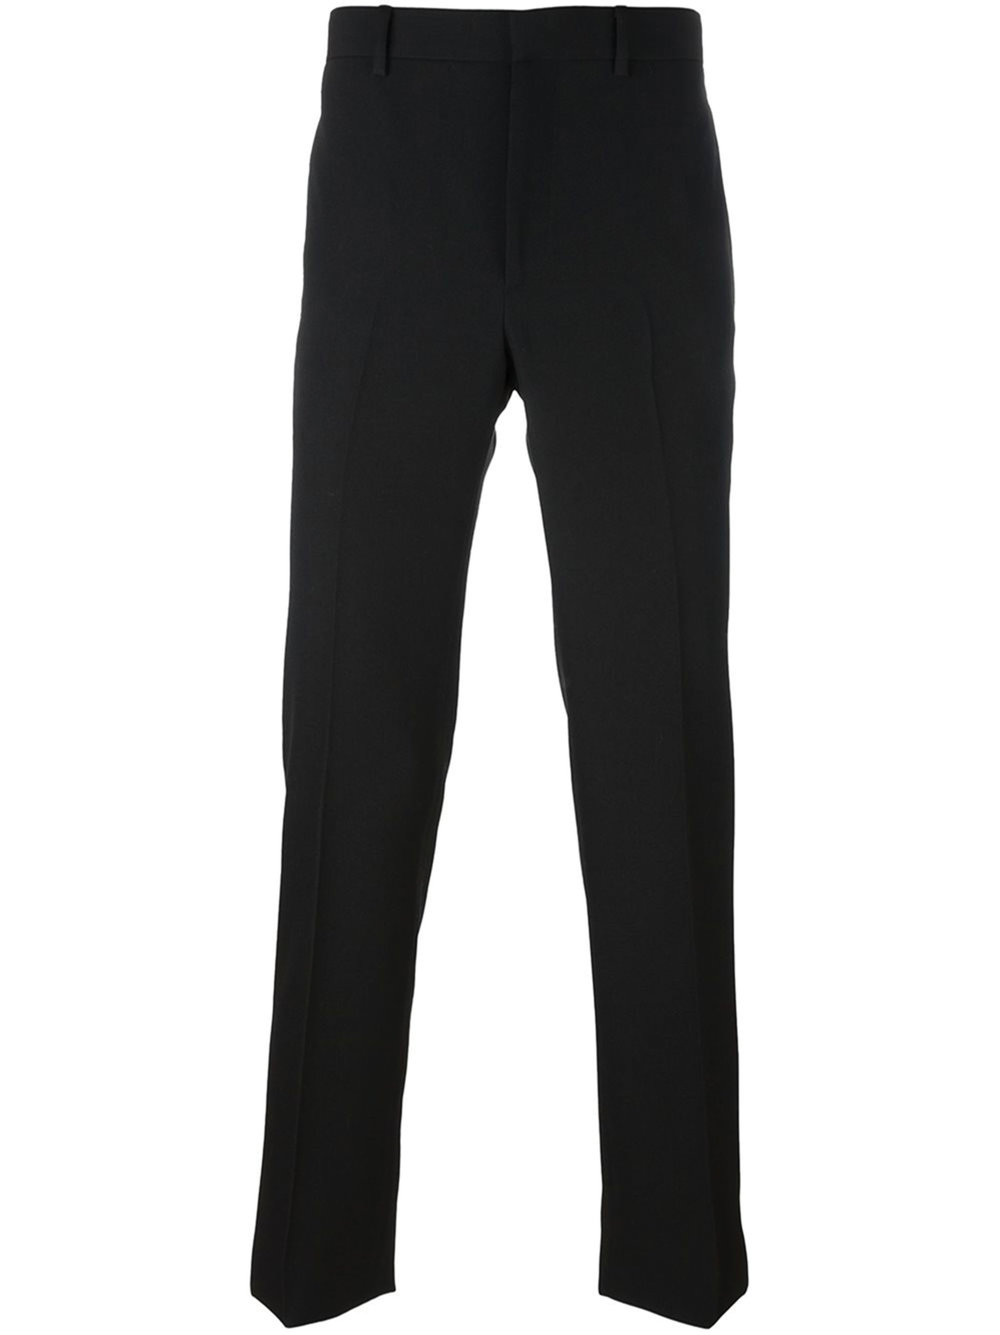 5.Givenchy 褲子 $1,320,  farfetch.ca